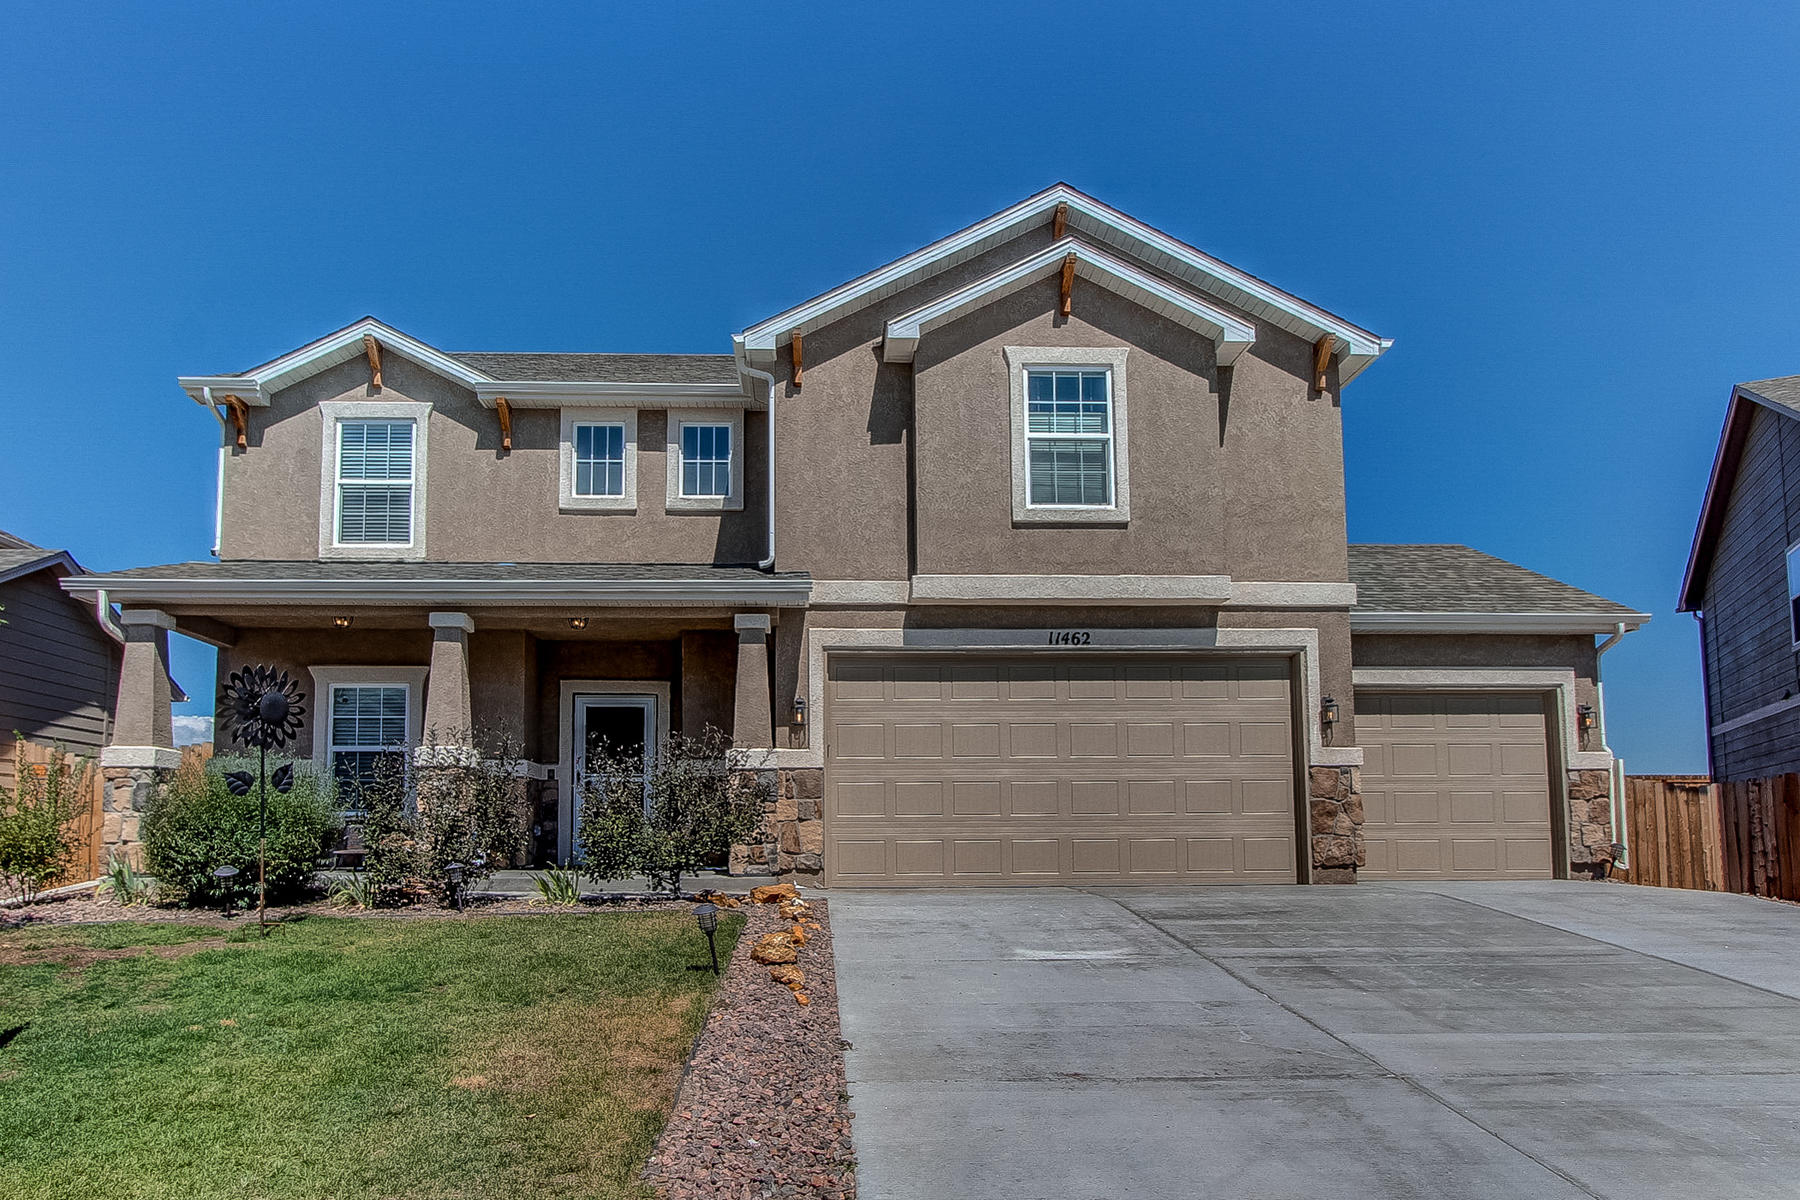 Single Family Homes for Active at 11462 Avena Road 11462 Avena Rd Peyton, Colorado 80831 United States